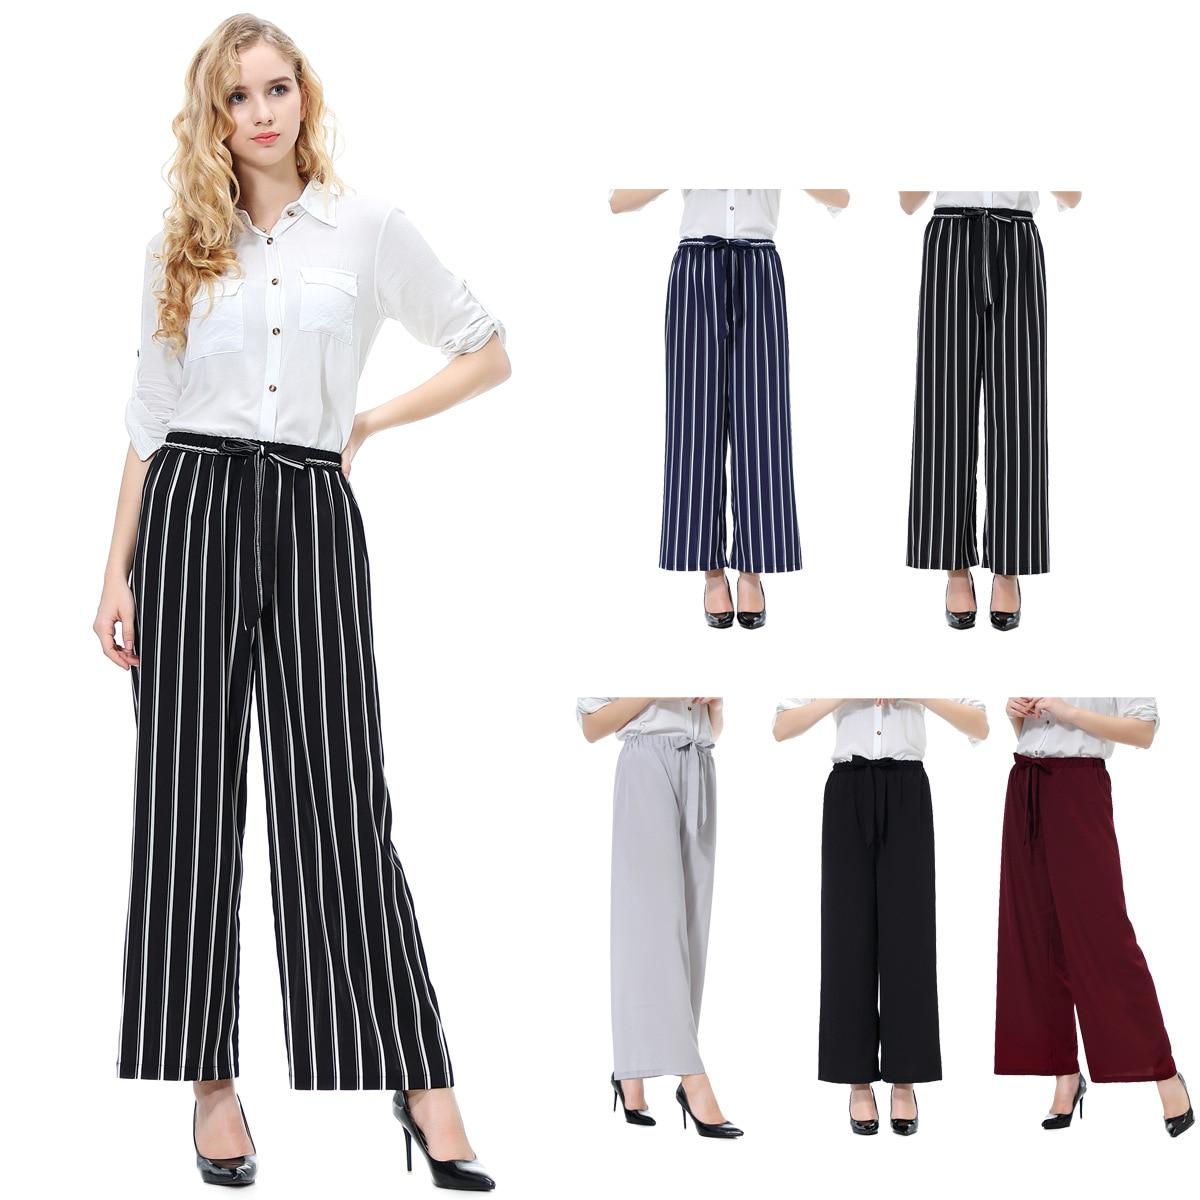 2019 Fashion Summer Muslim Ladies Casual Long Wide Leg Pants